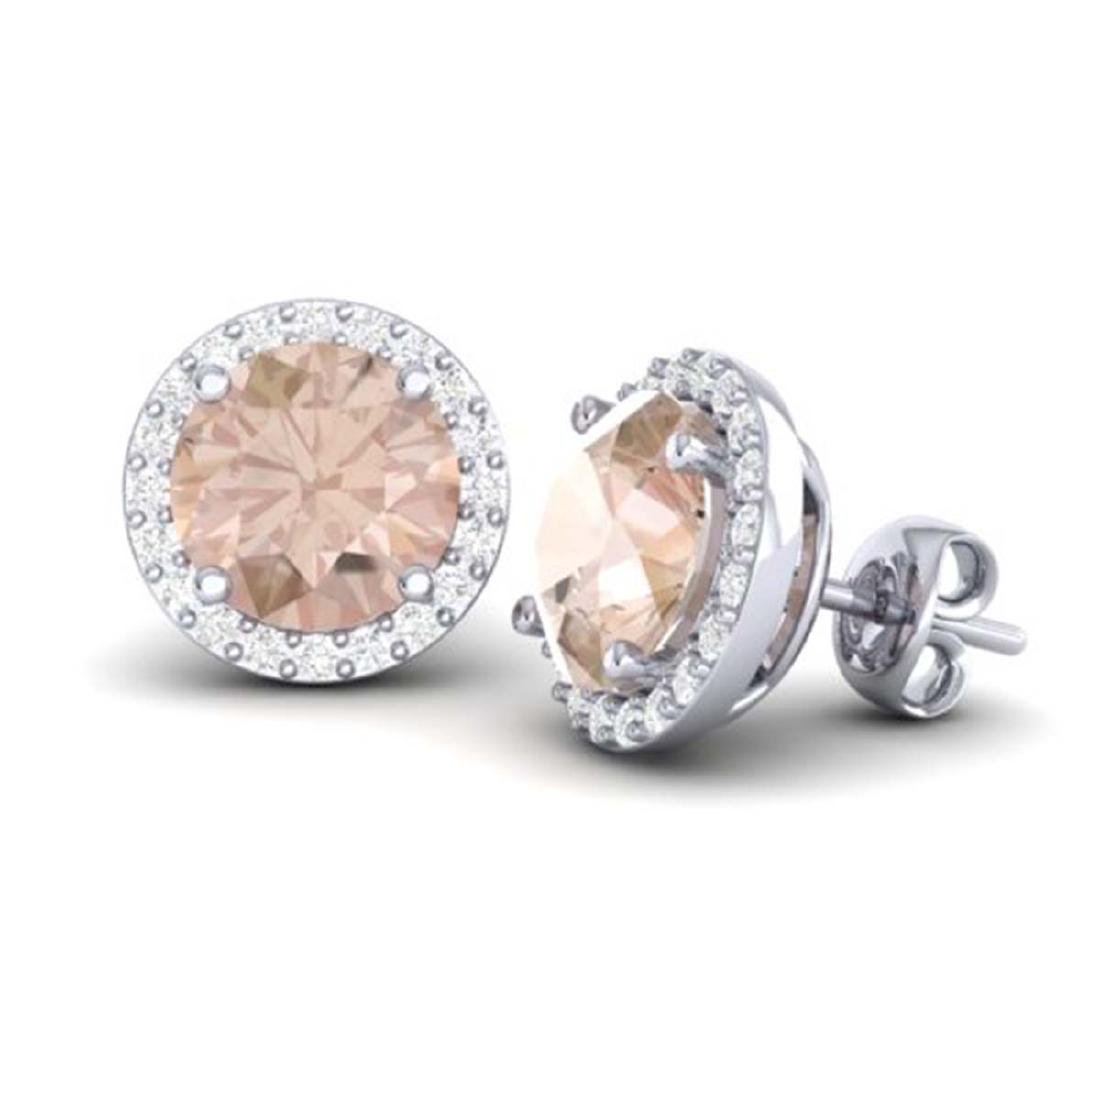 3 ctw Morganite & Halo VS/SI Diamond Earrings 18K White - 2